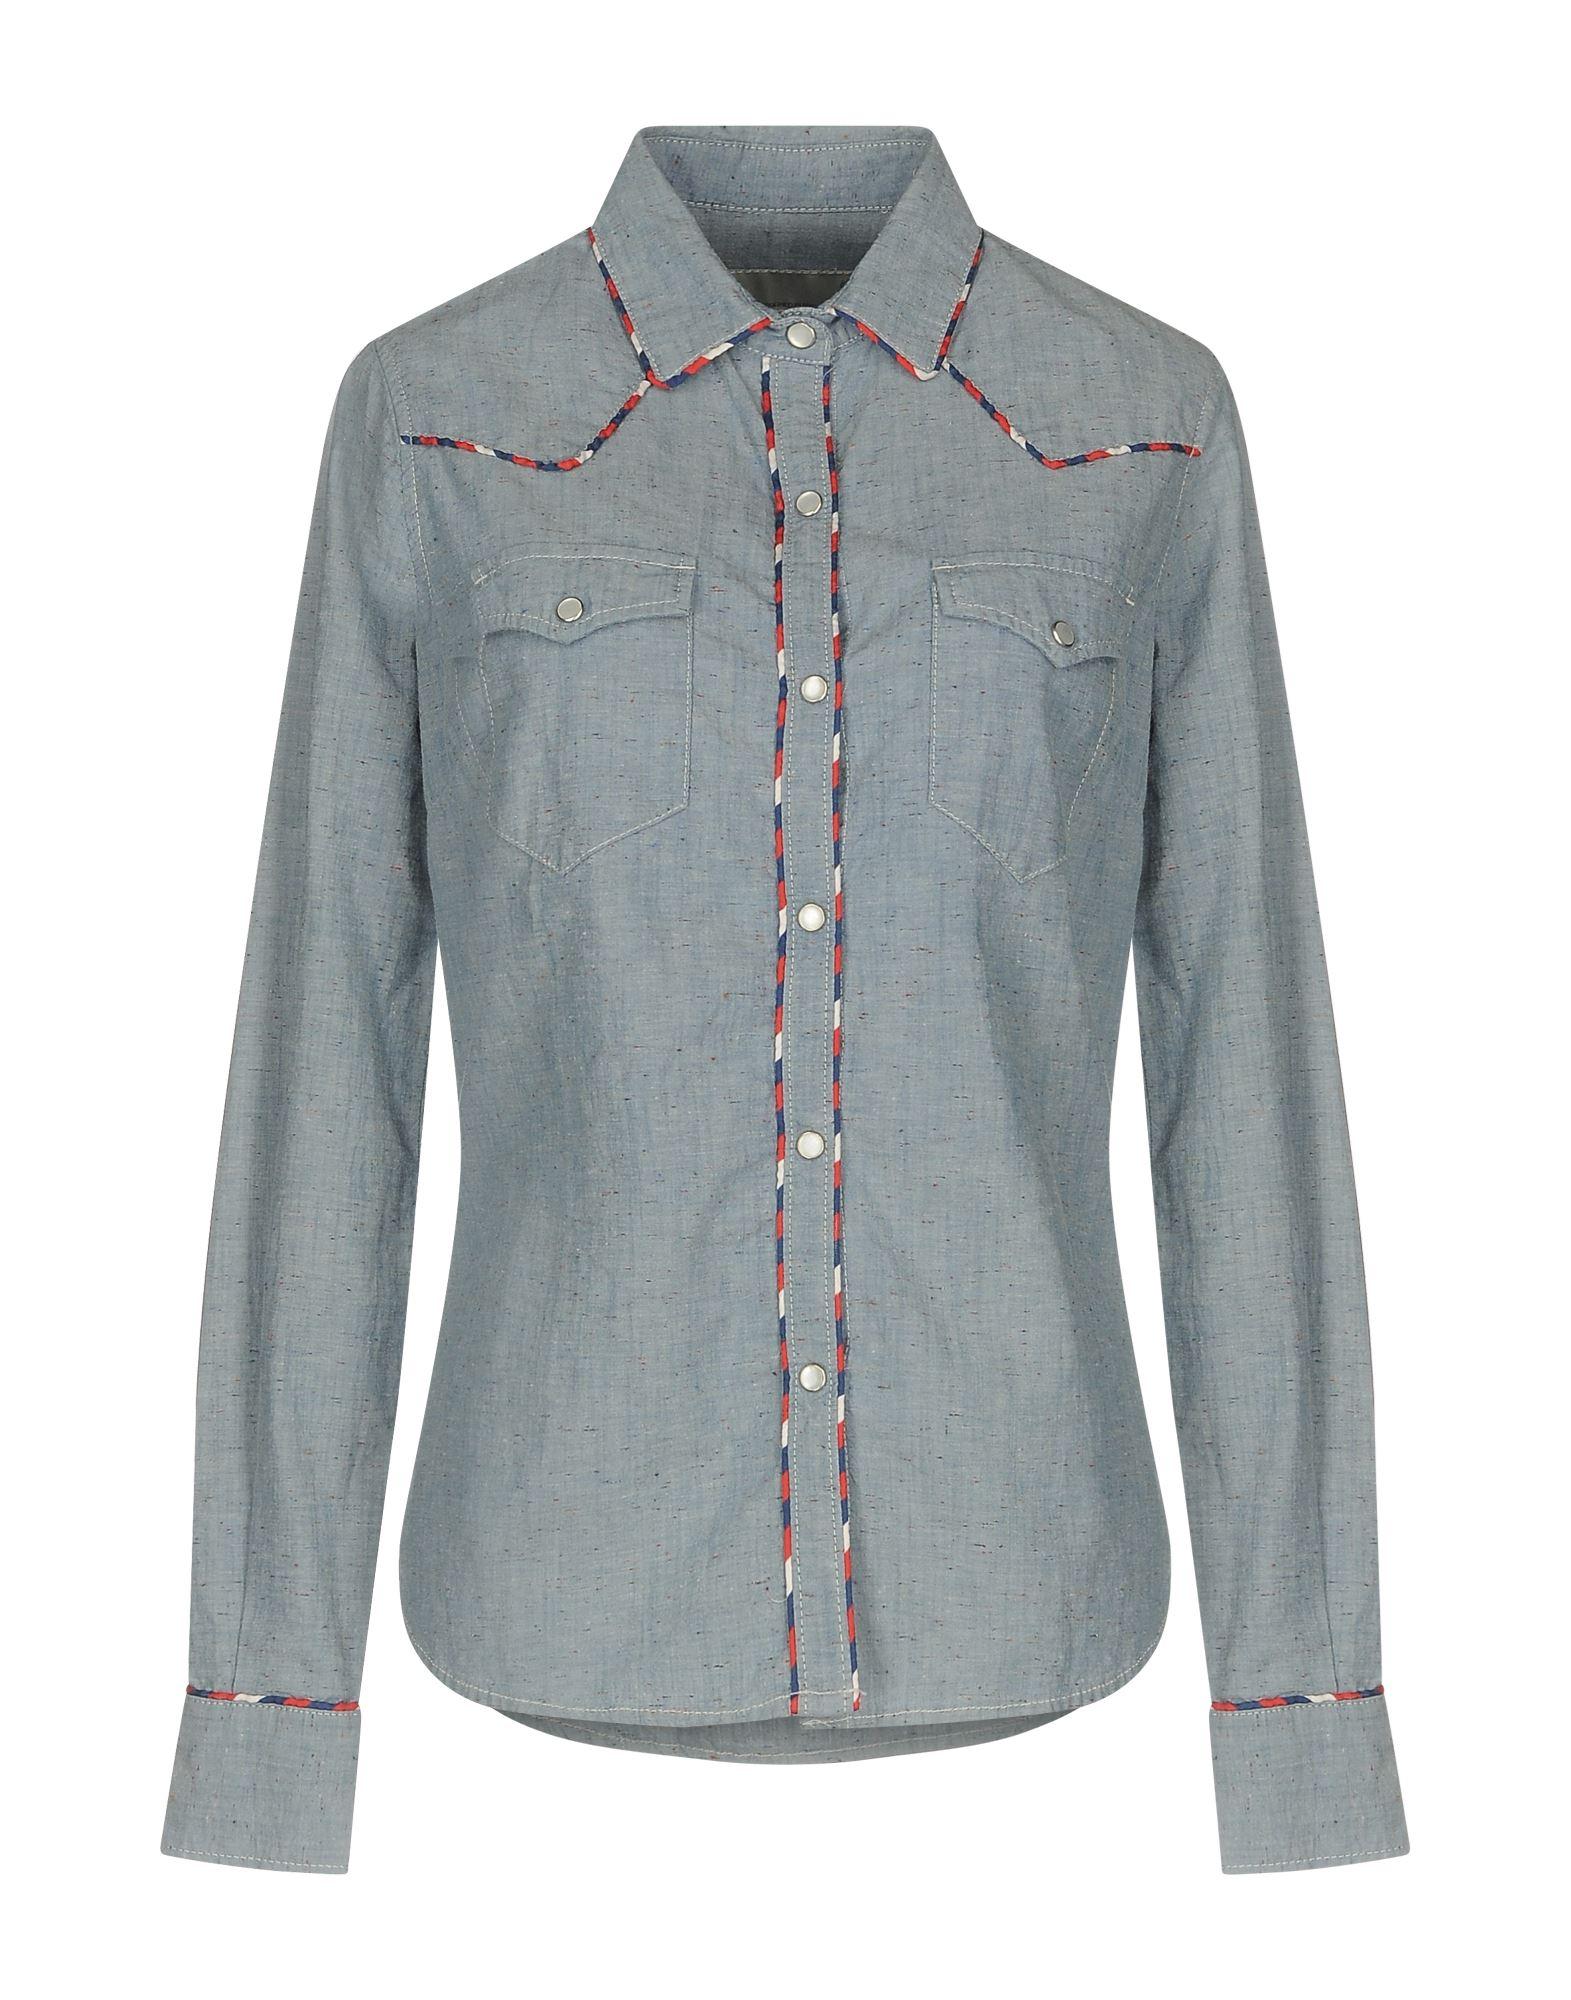 ROŸ ROGER'S Джинсовая рубашка рубашка джинсовая 3 12 лет